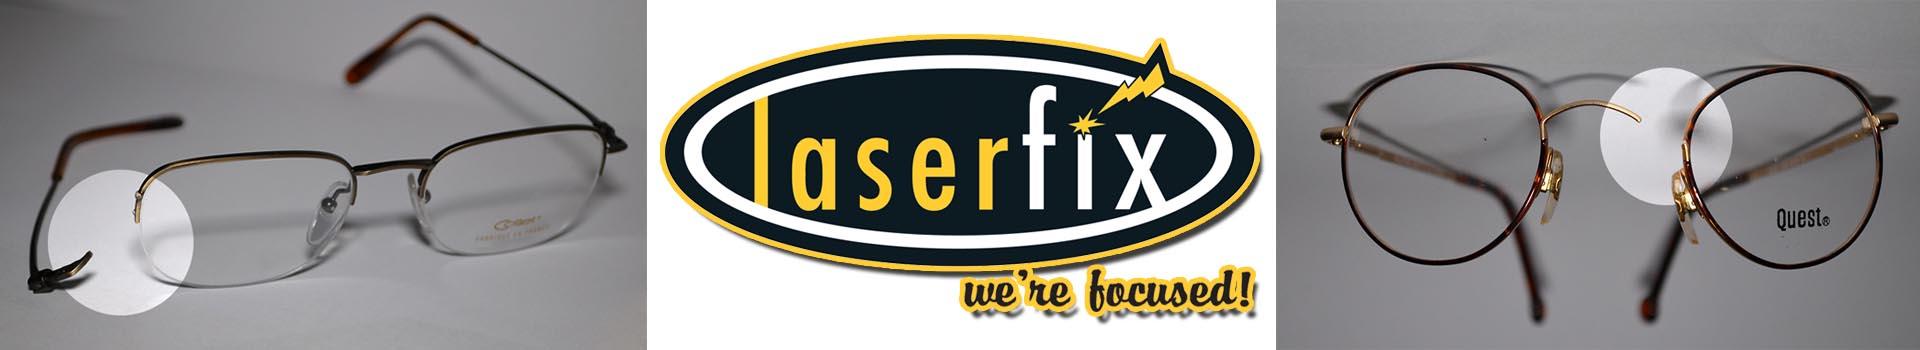 Laserfix